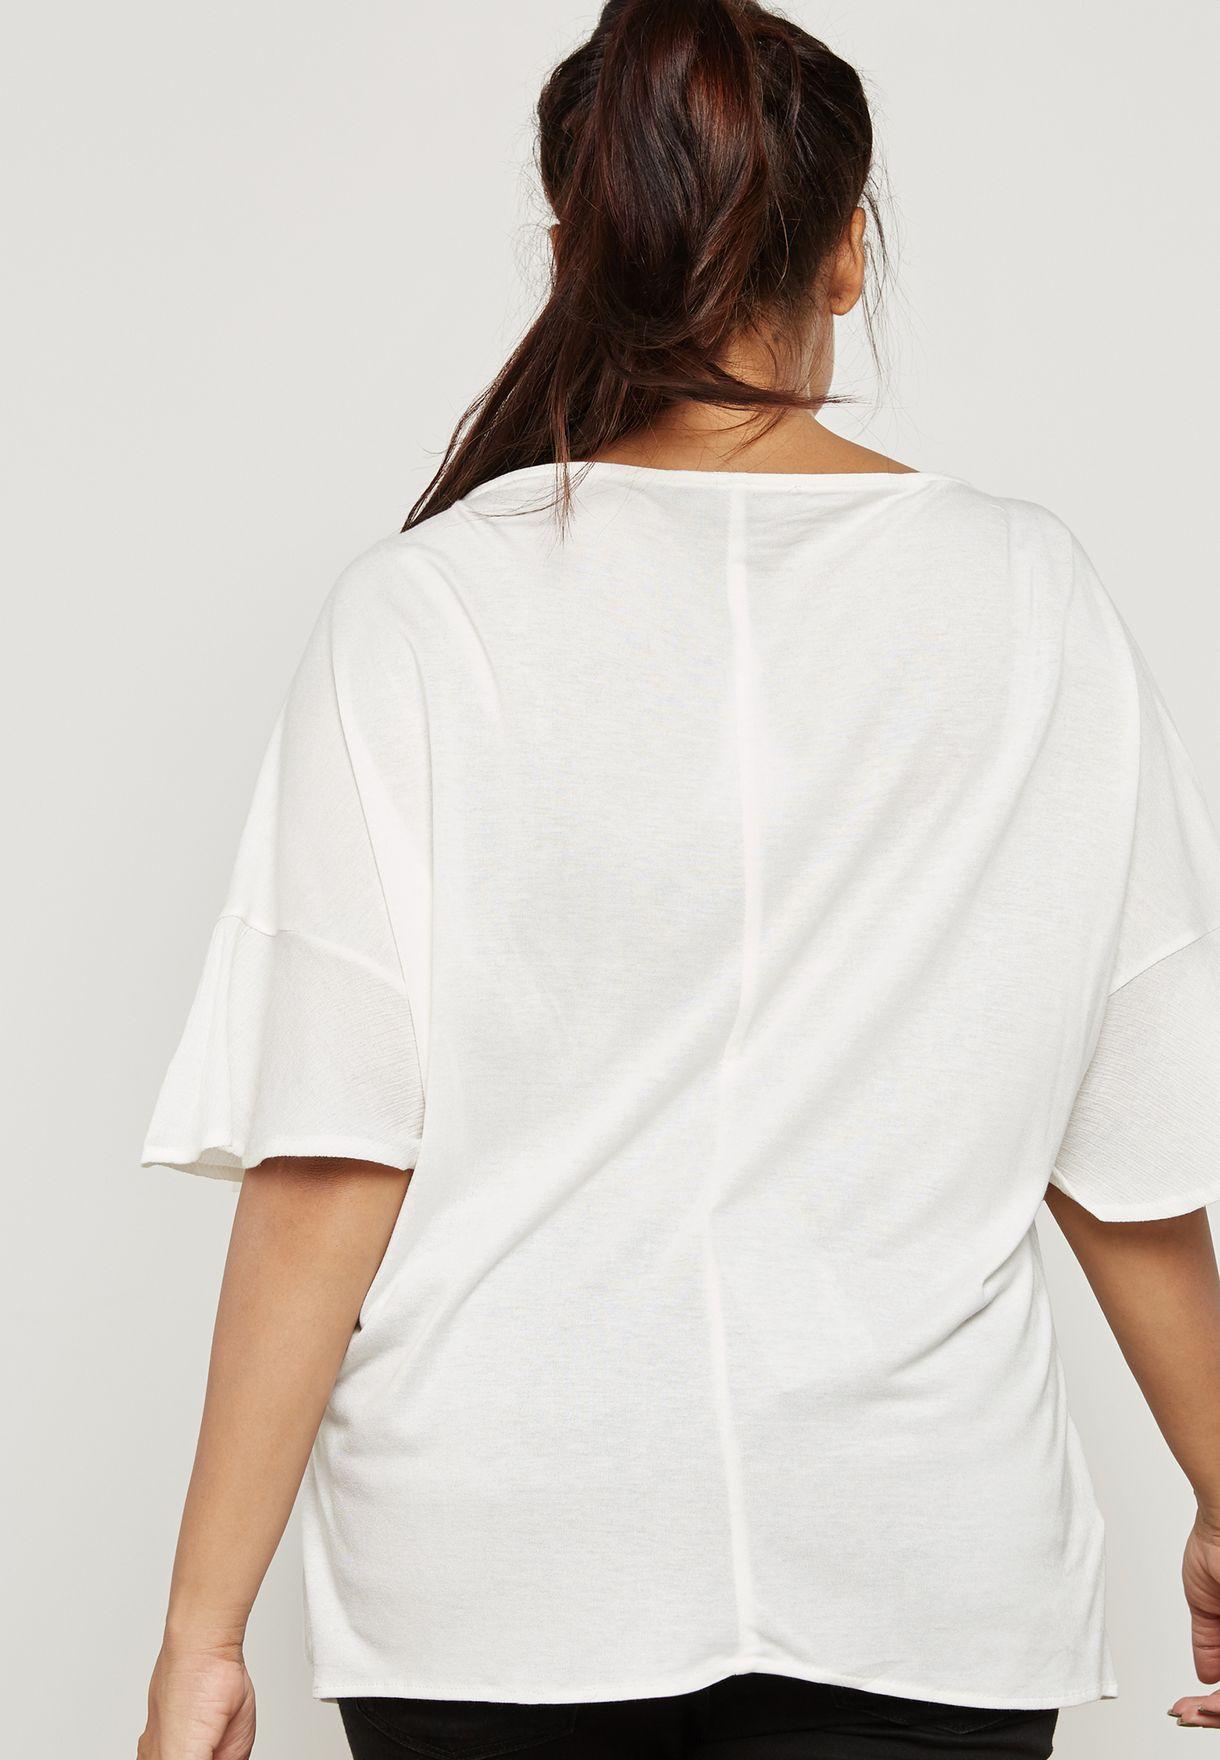 Tassel Detail T-Shirt